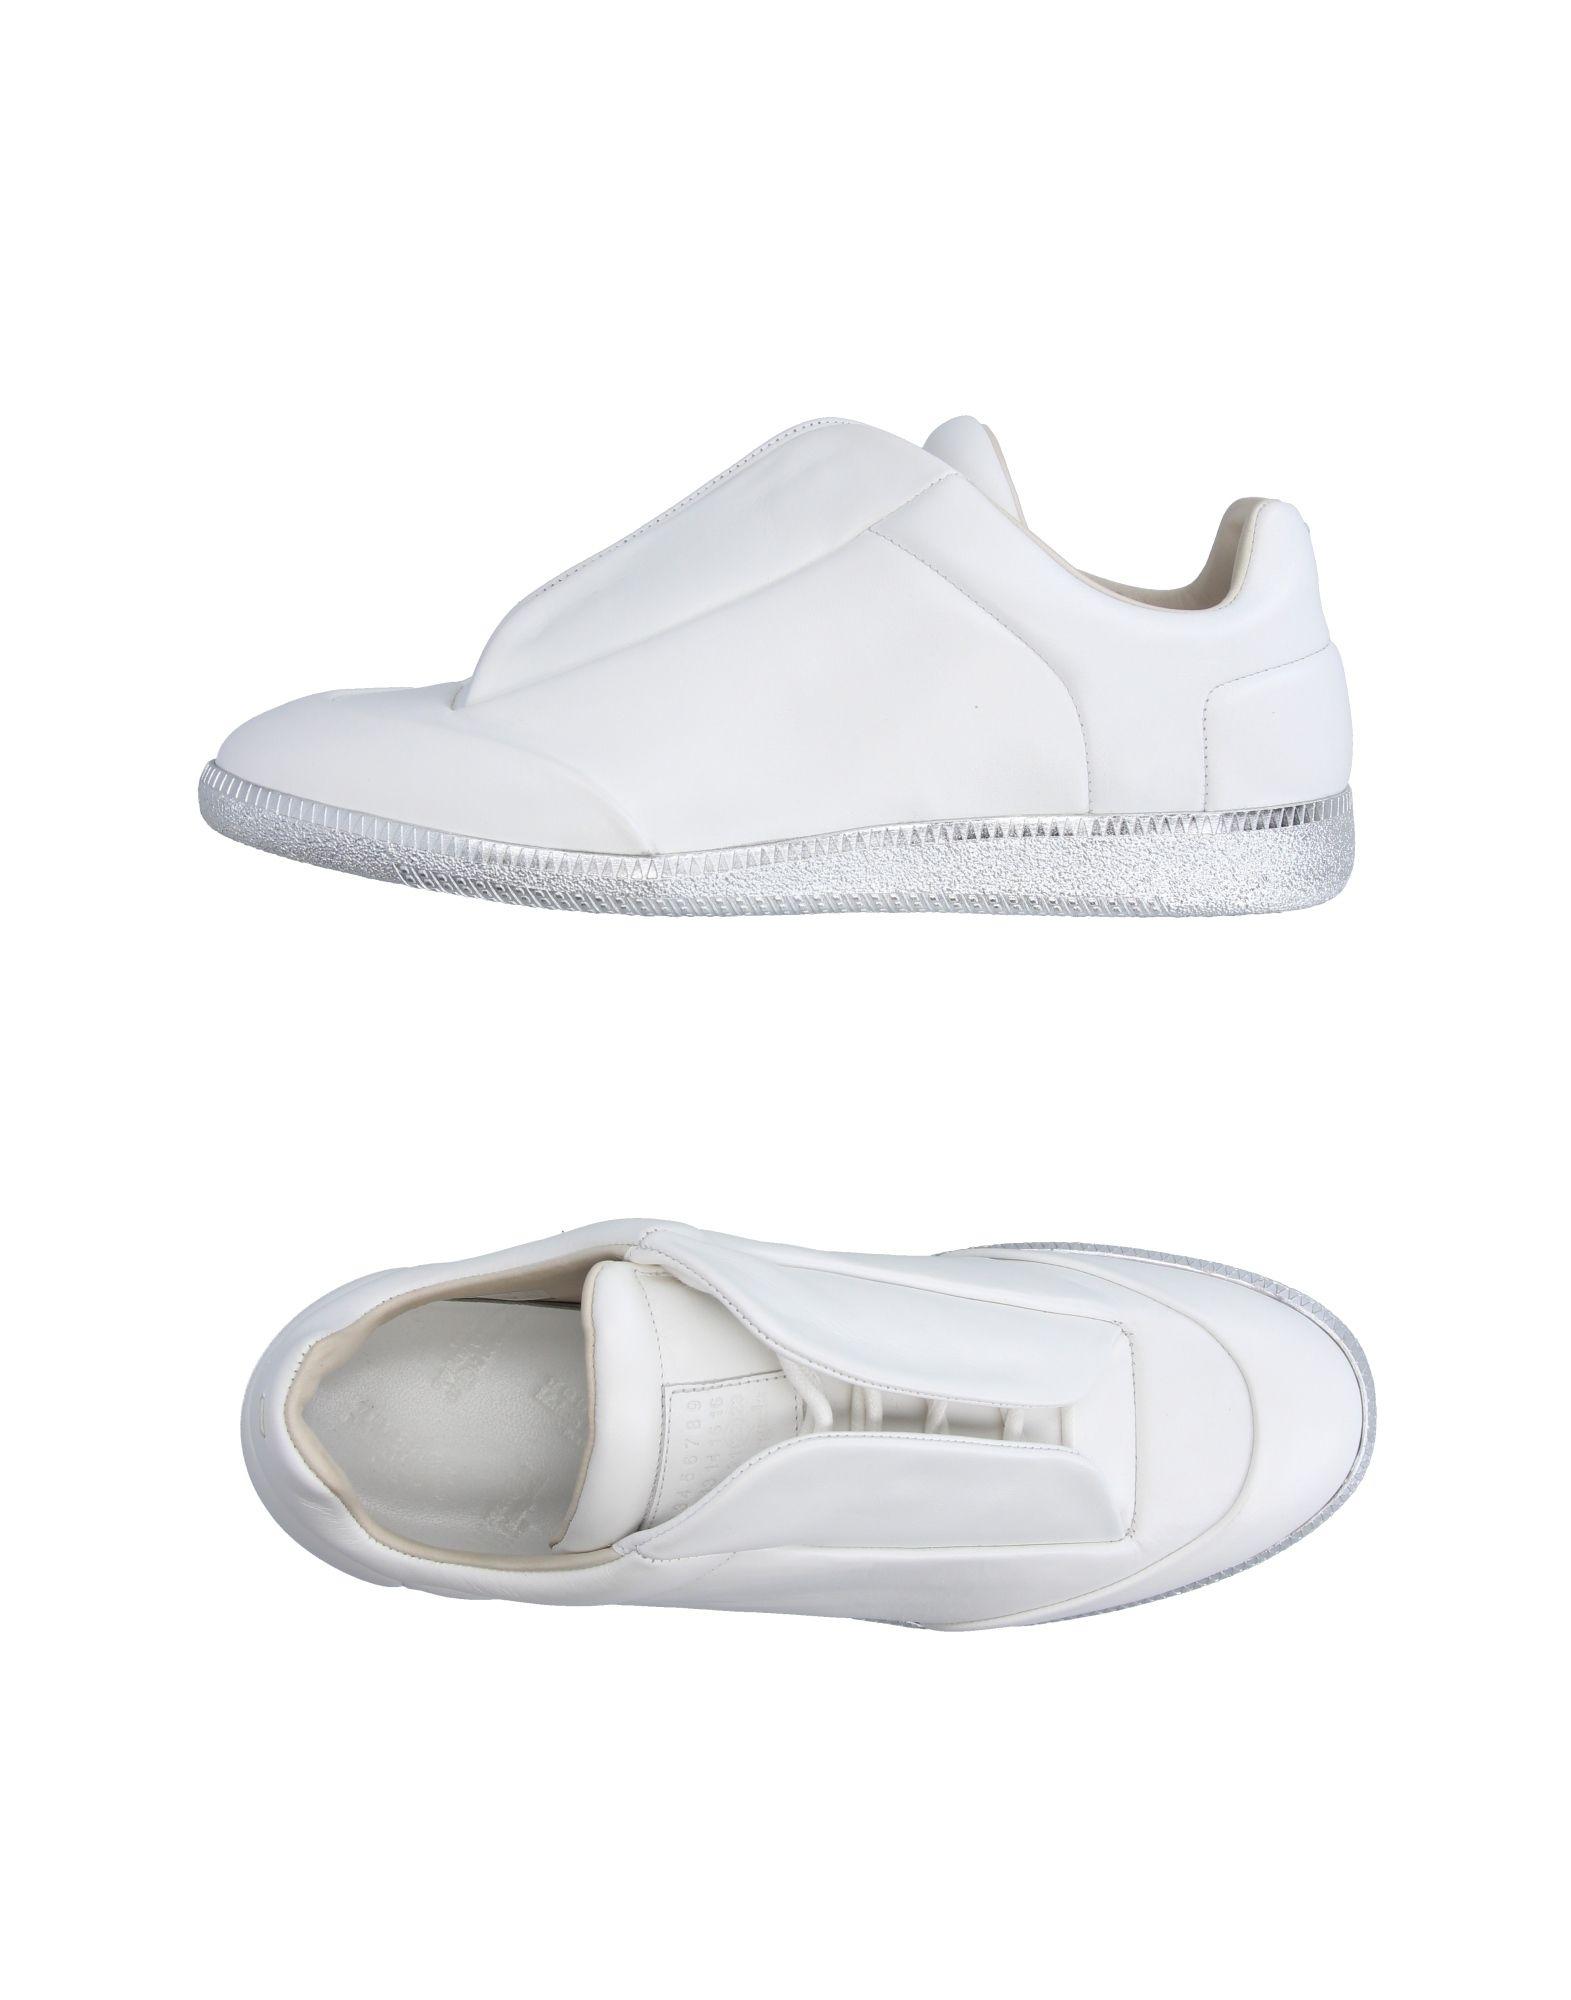 Maison Margiela Sneakers Herren  11228796JD Gute Qualität beliebte Schuhe